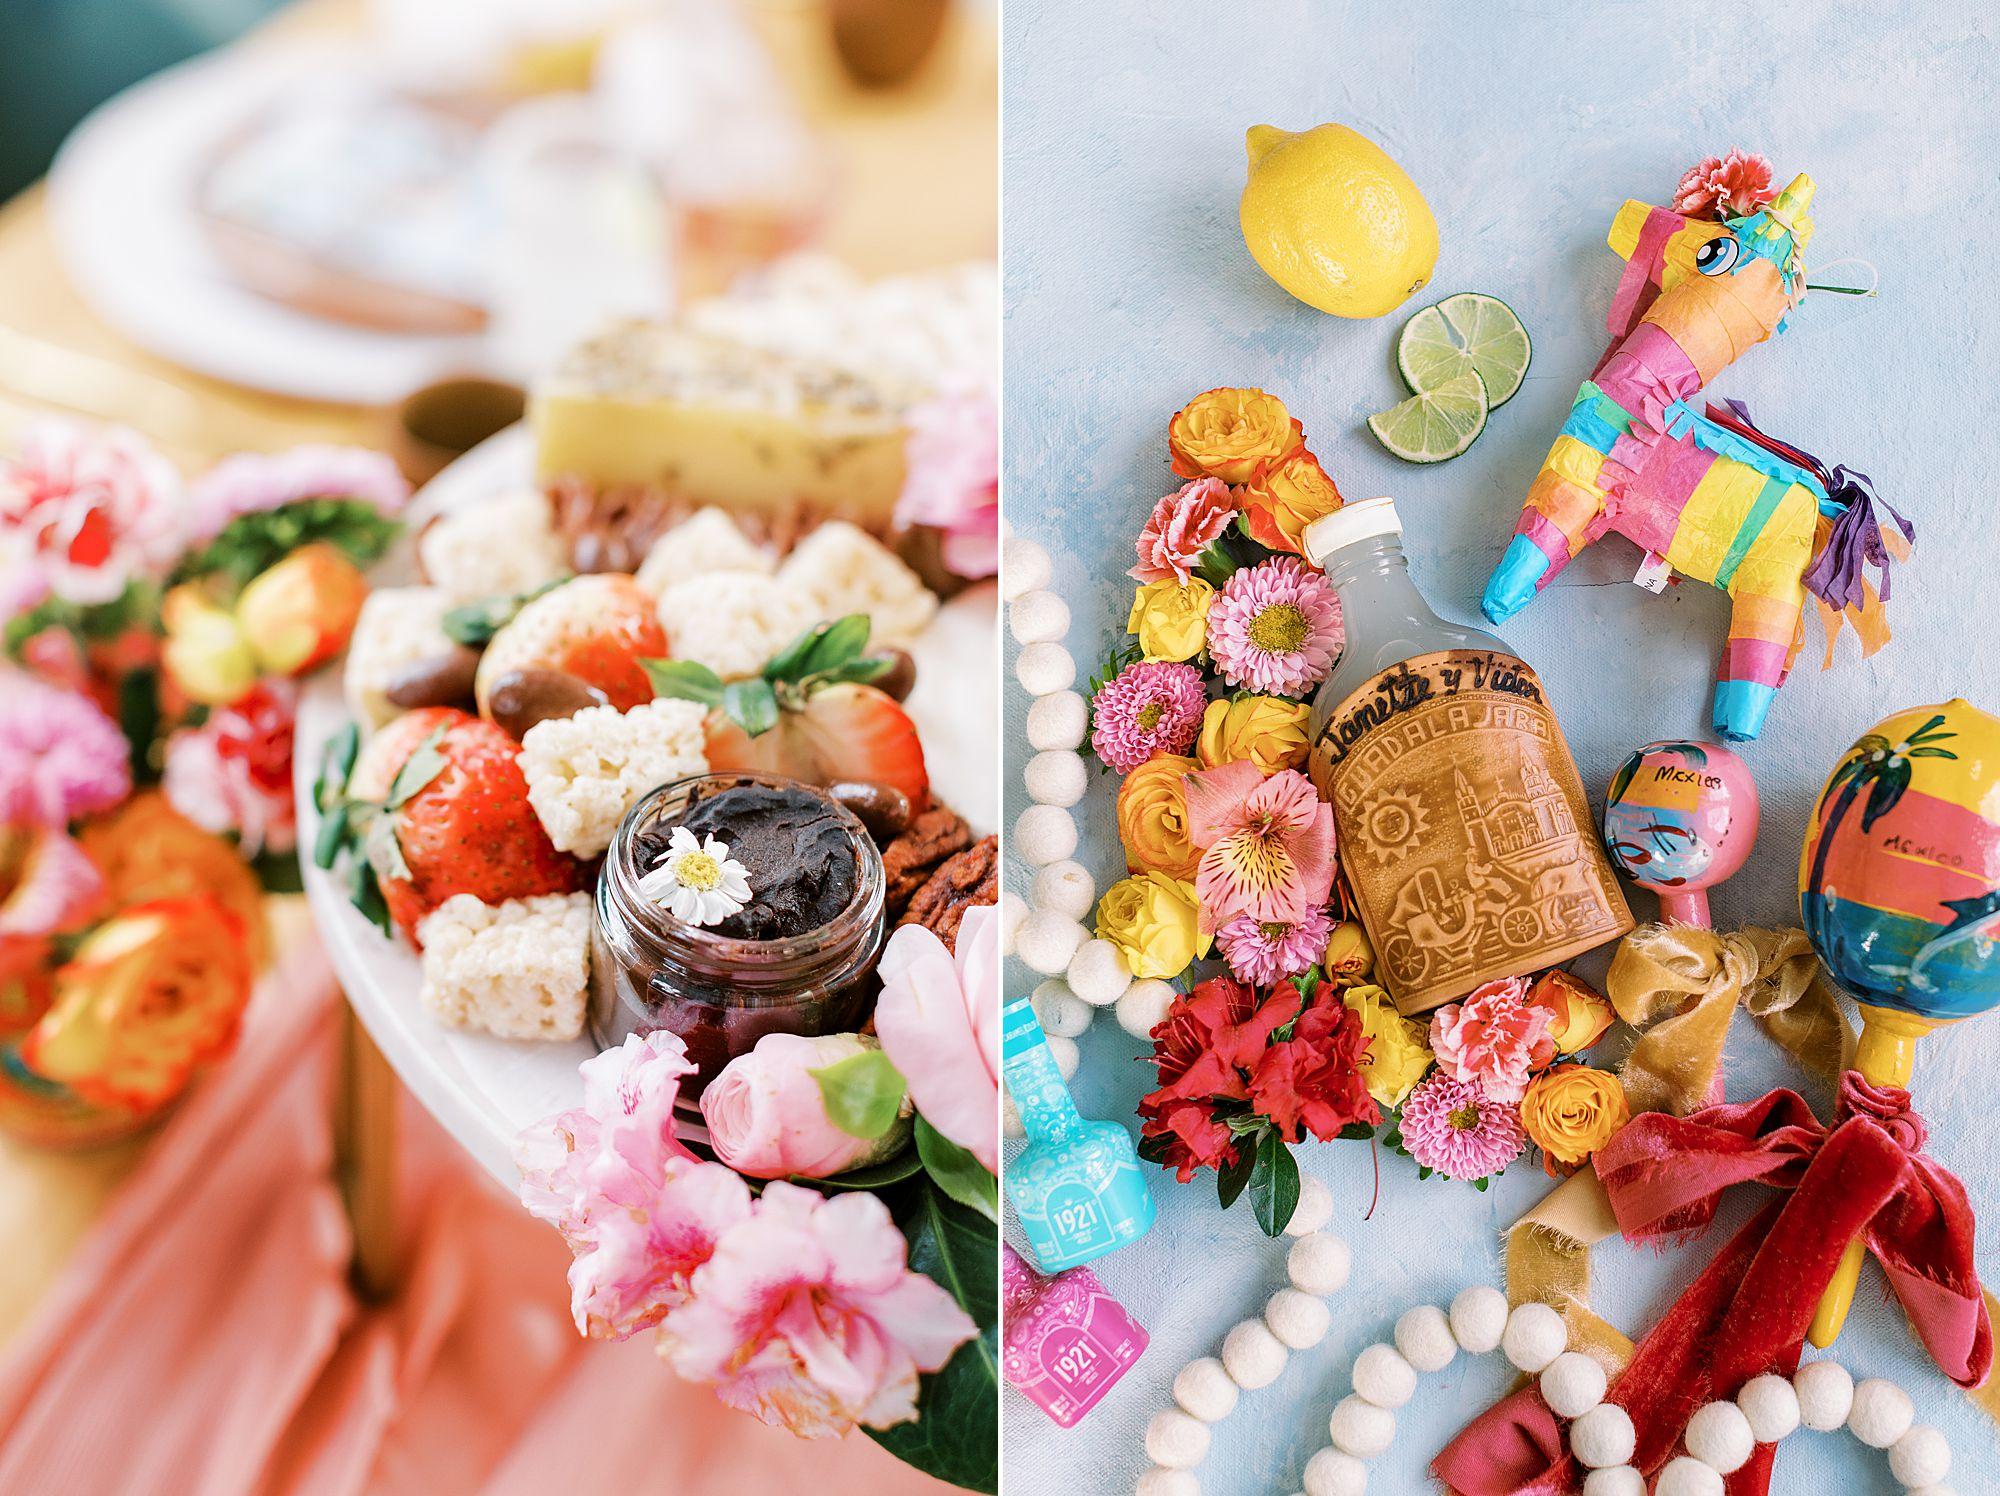 Cinco De Mayo Inspiration for Your FIesta - Party Crush Studio and Ashley Baumgartner_0061.jpg